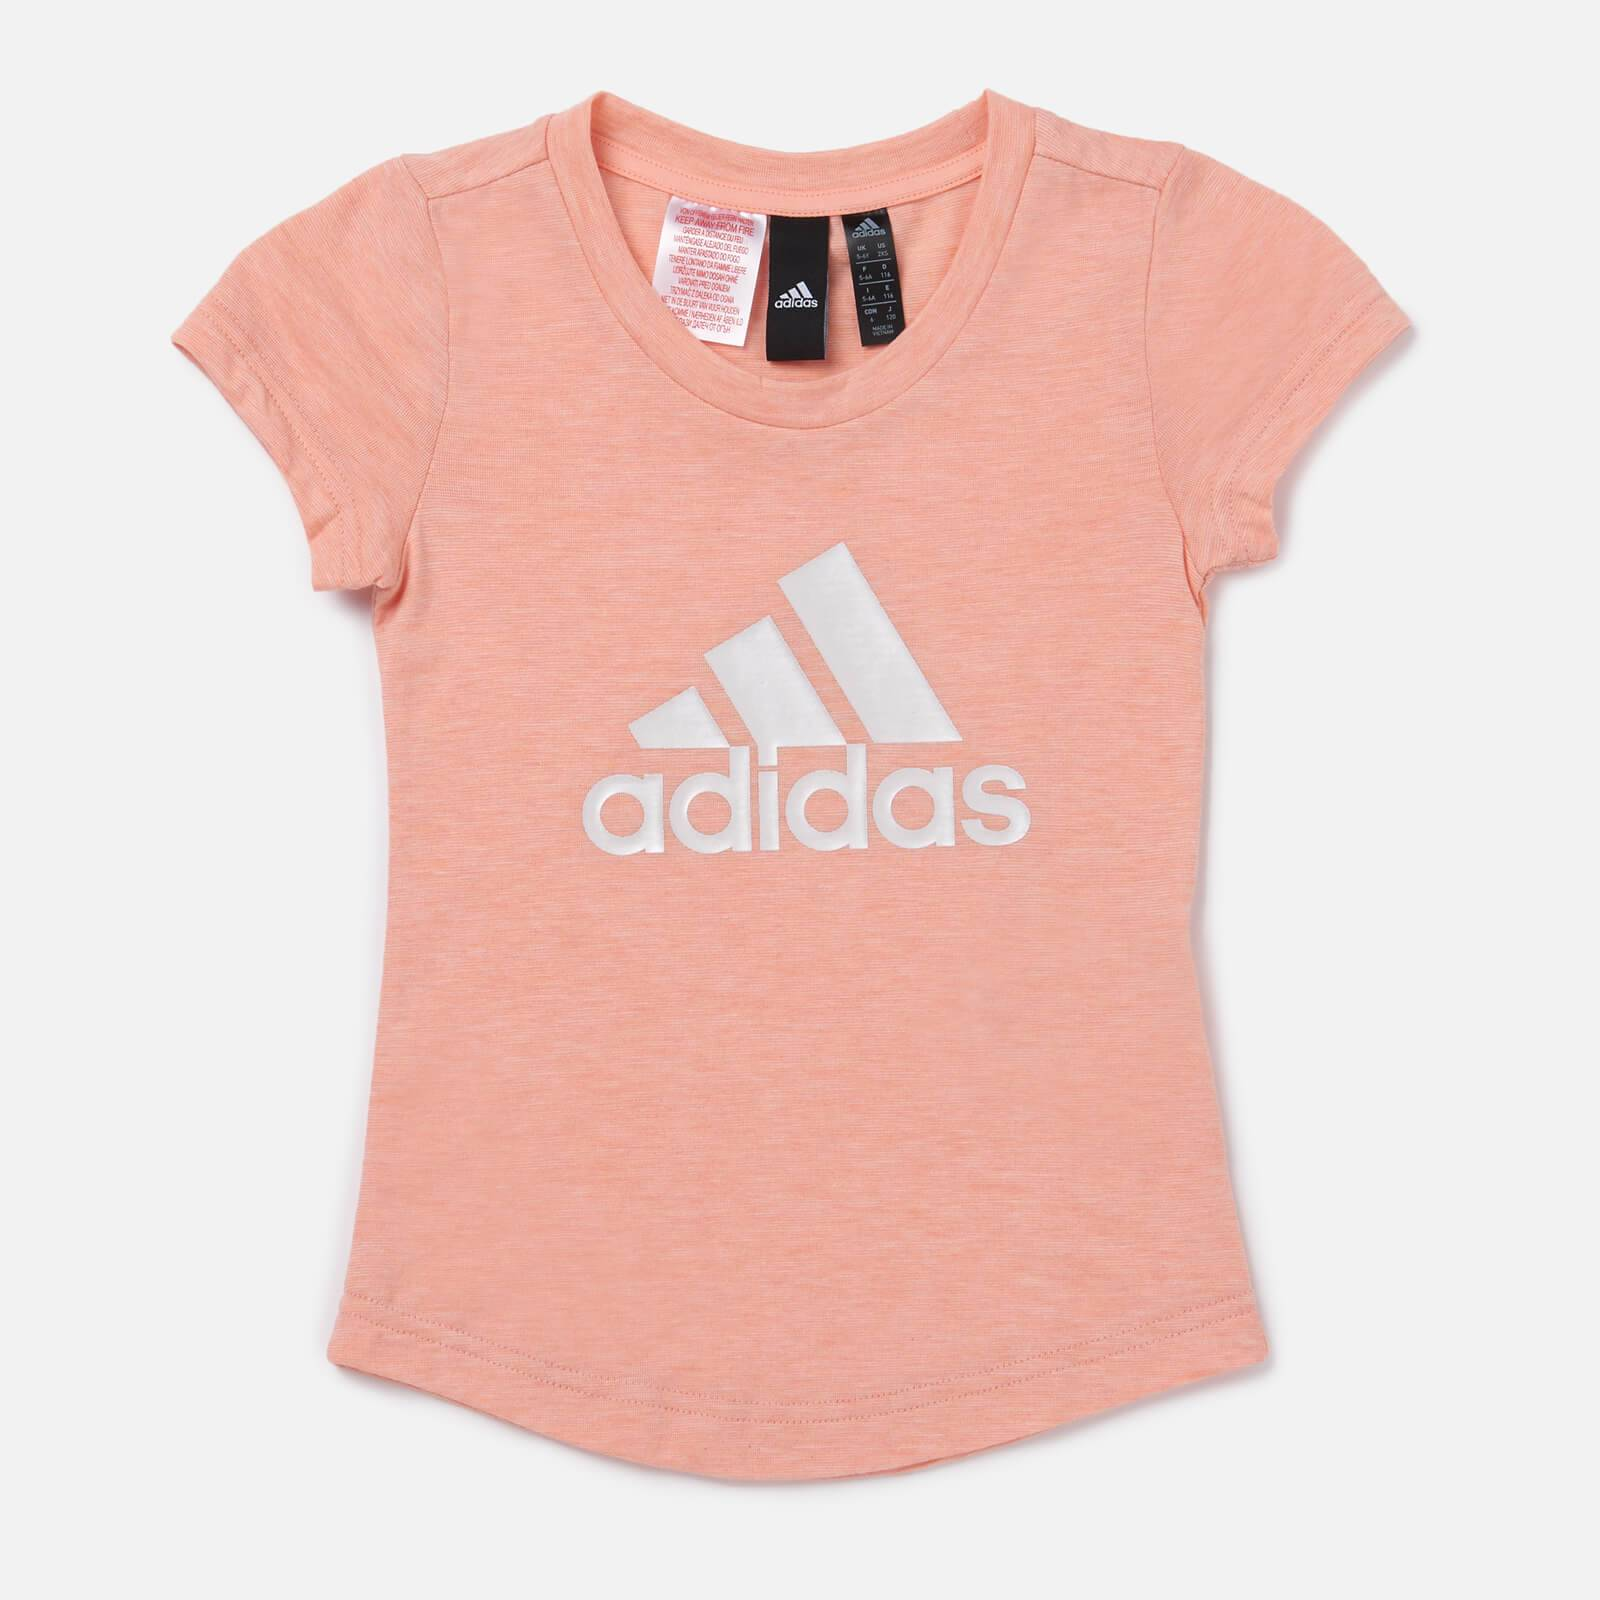 adidas Girls' Young Girls Winner T-Shirt - Pink - 11-12 Years